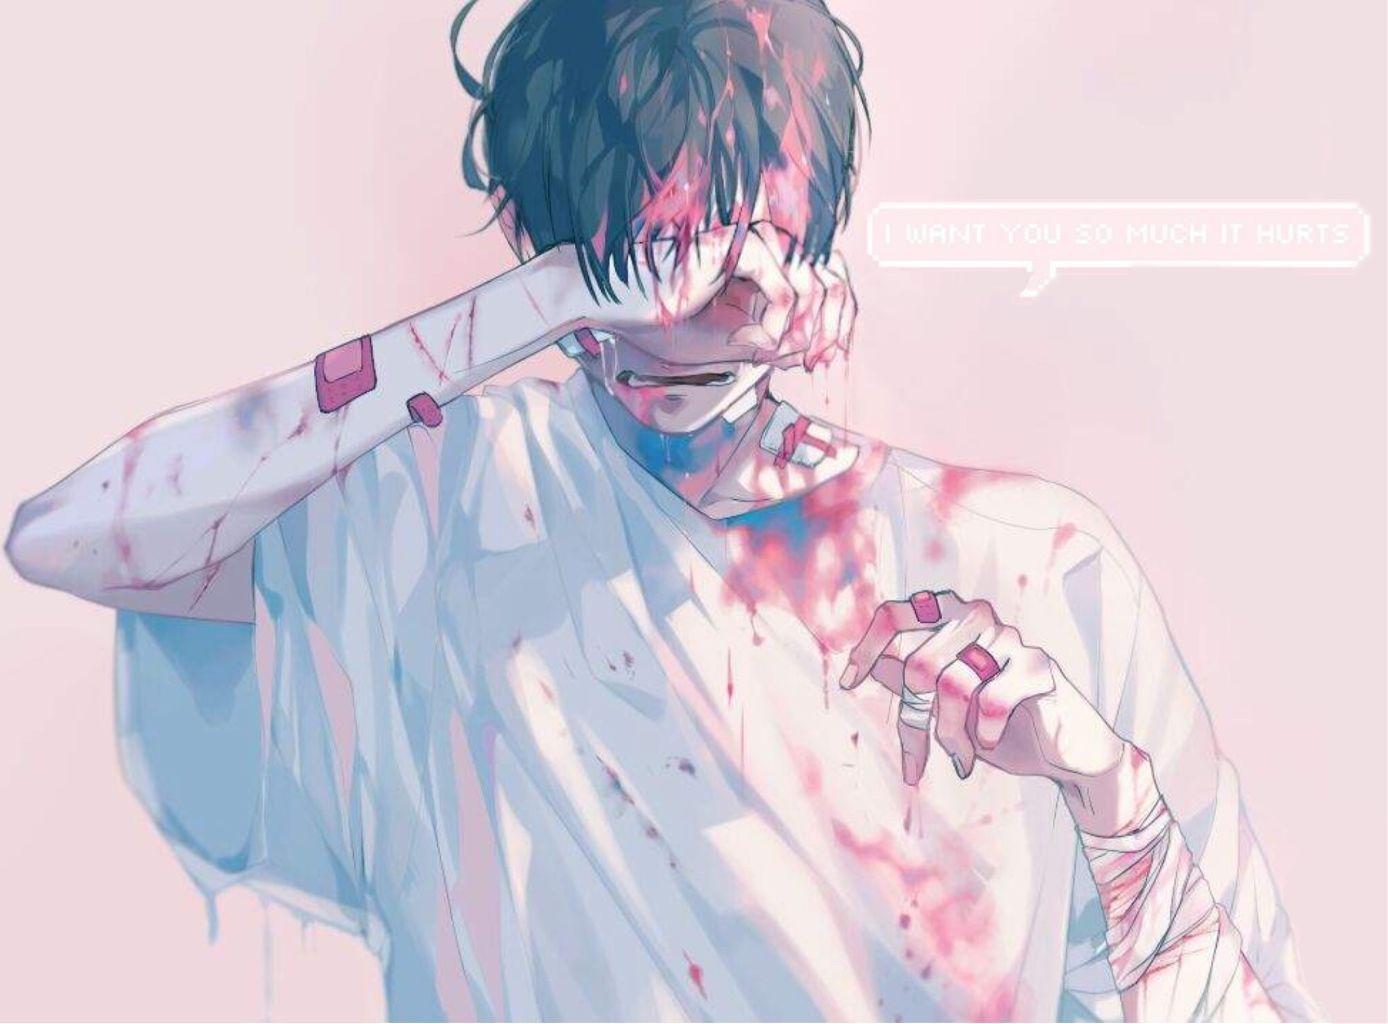 Aesthetics Anime Boy Wallpapers Wallpaper Cave